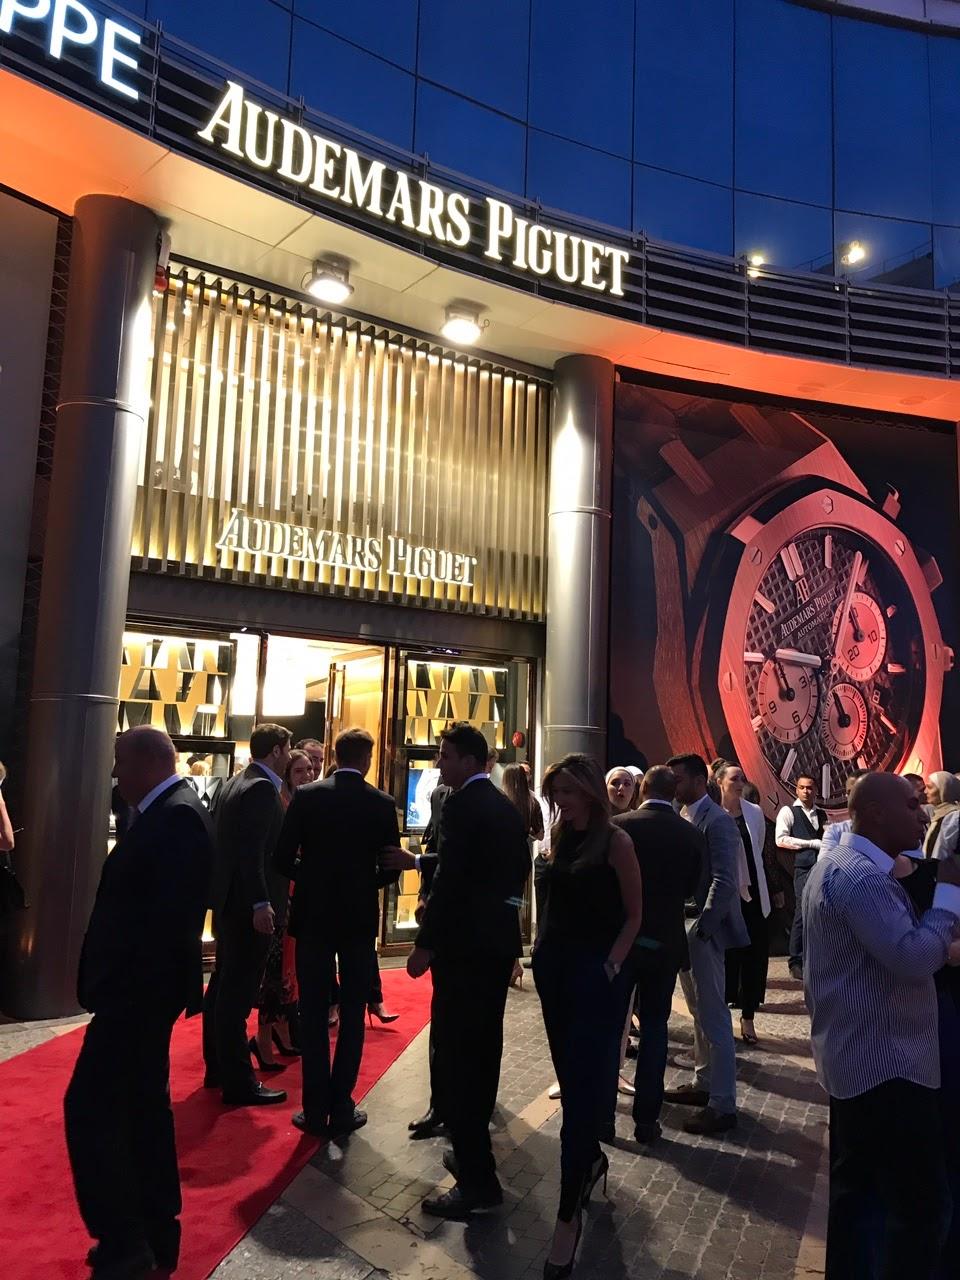 Audemars Piguet New Ap Boutique Amman